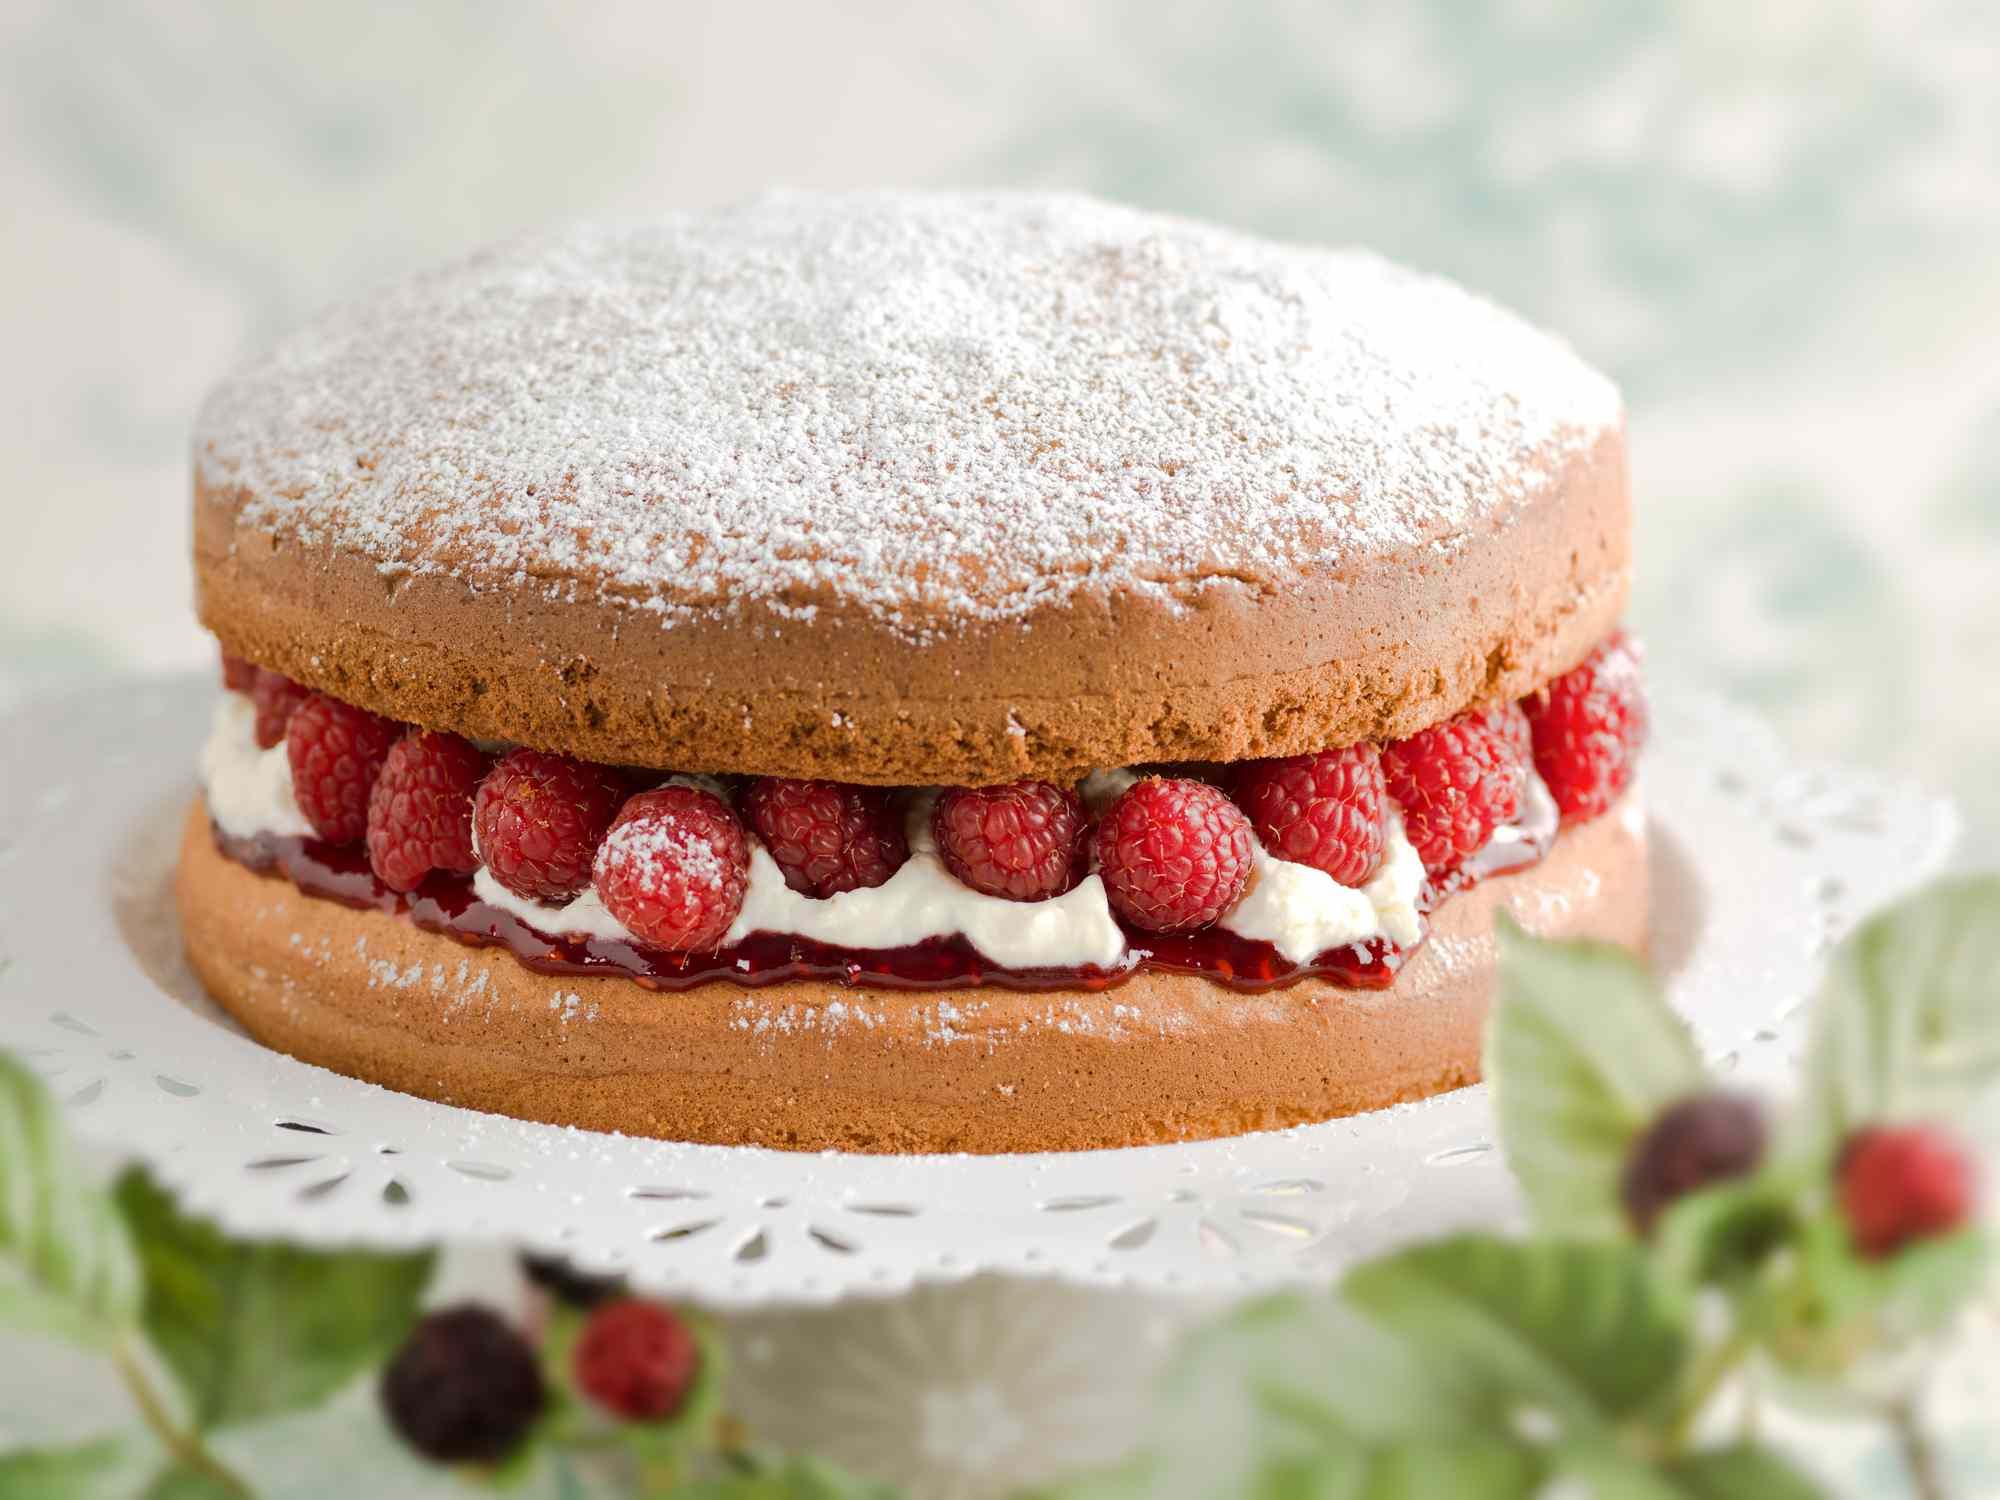 Victoria sponge cake filled with fresh whipped cream, rasberries and jam on white platter.